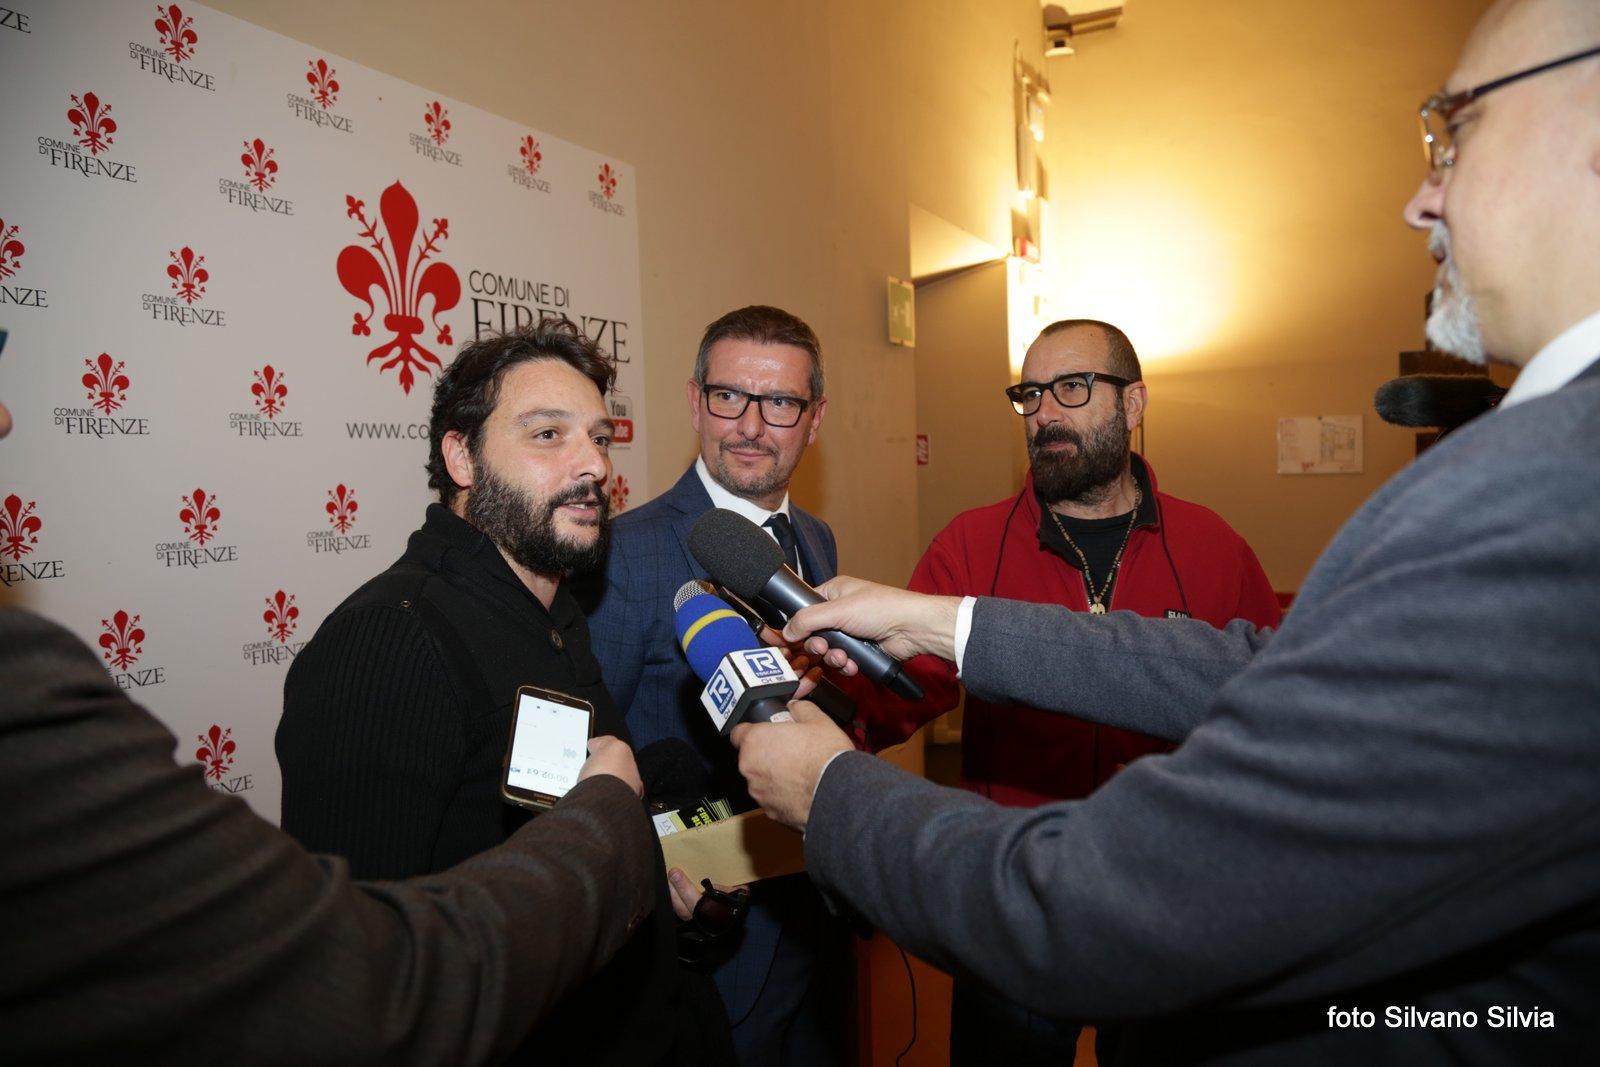 Mirco Dinamo Rufilli intervistato